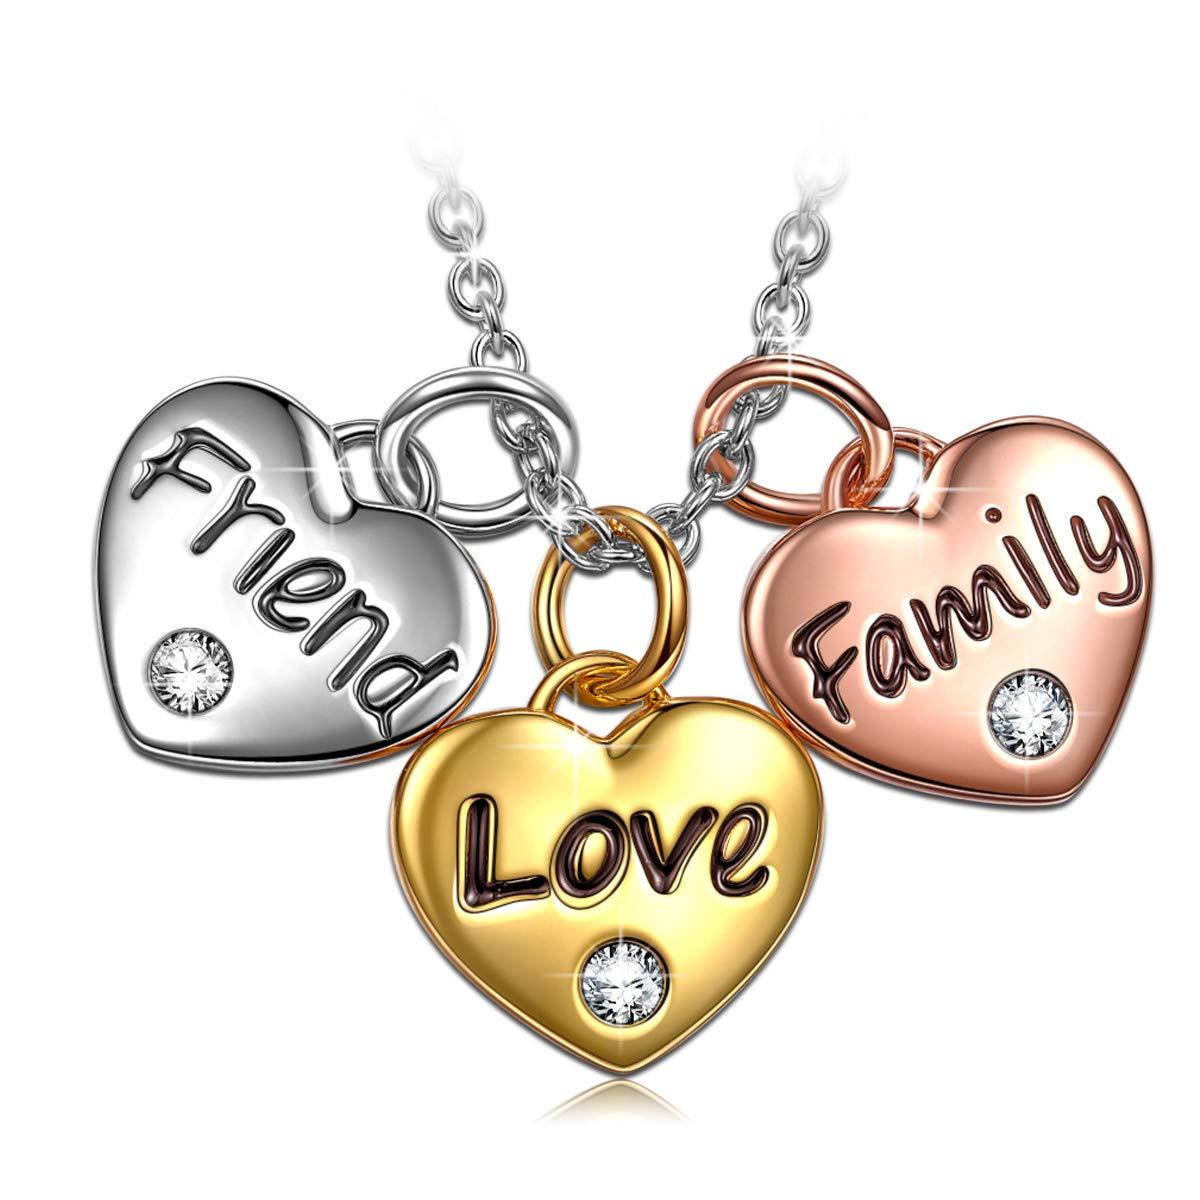 Mom Mum Girlfriend Charm gift box 925 Silver Love Heart Valentines Day wife